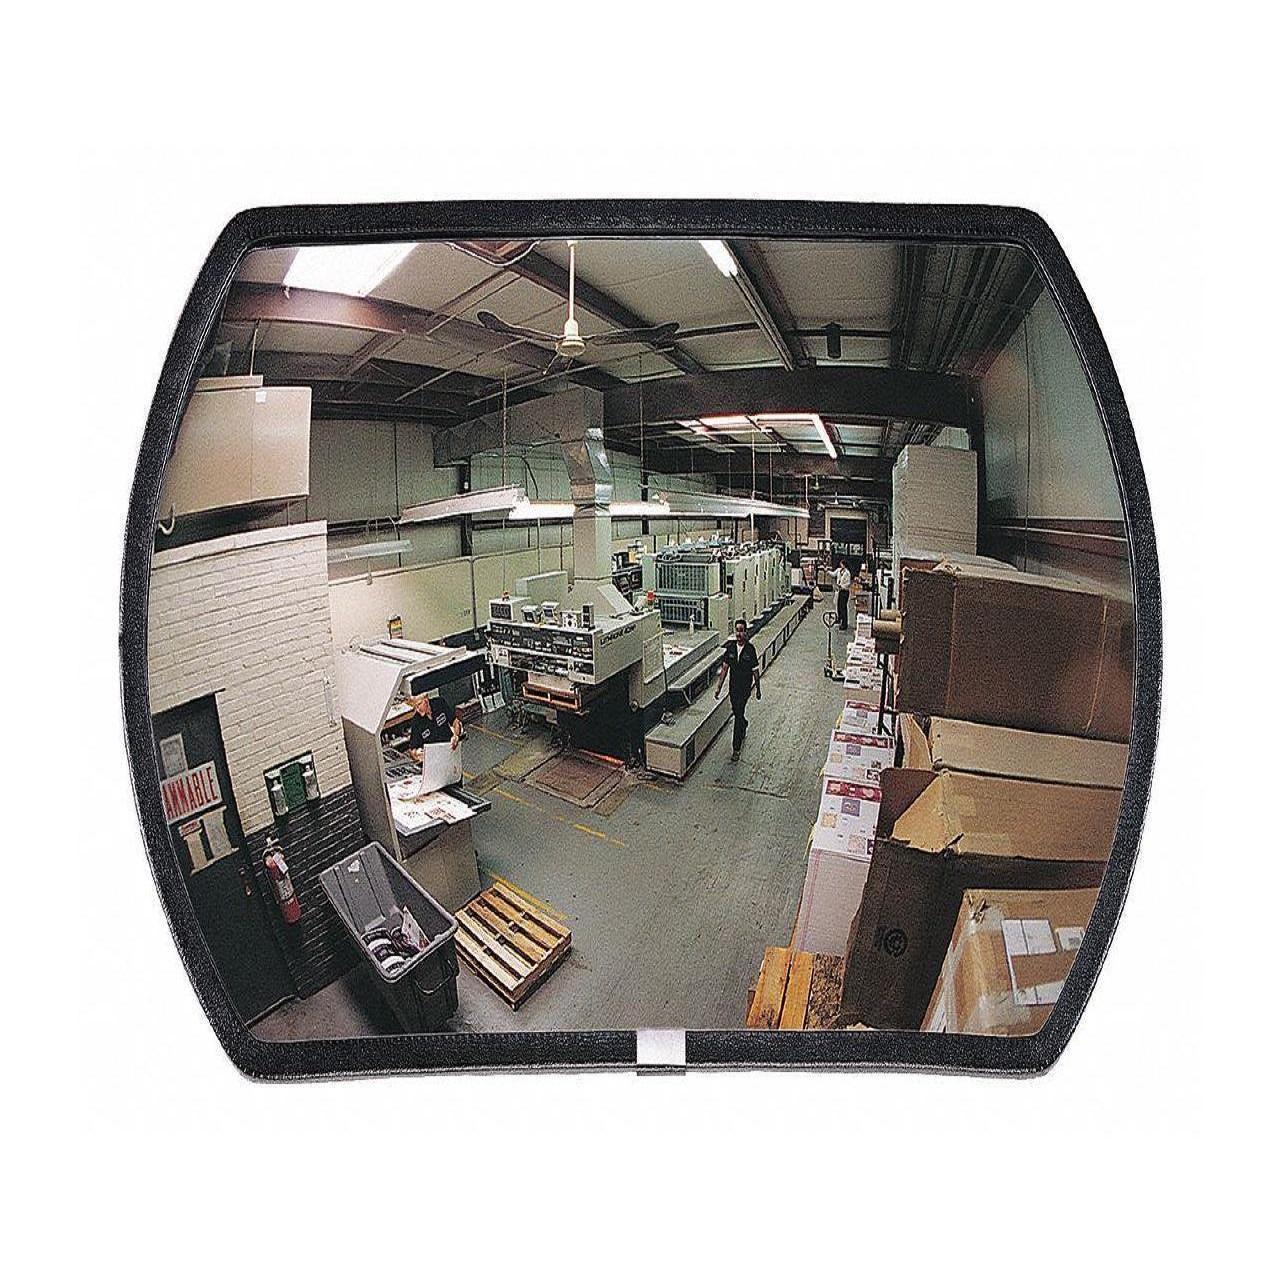 Se-Kure SCVO-36TPB 36 in Outdoor Convex Mirror, Acrylic Lens, Plastic Backing